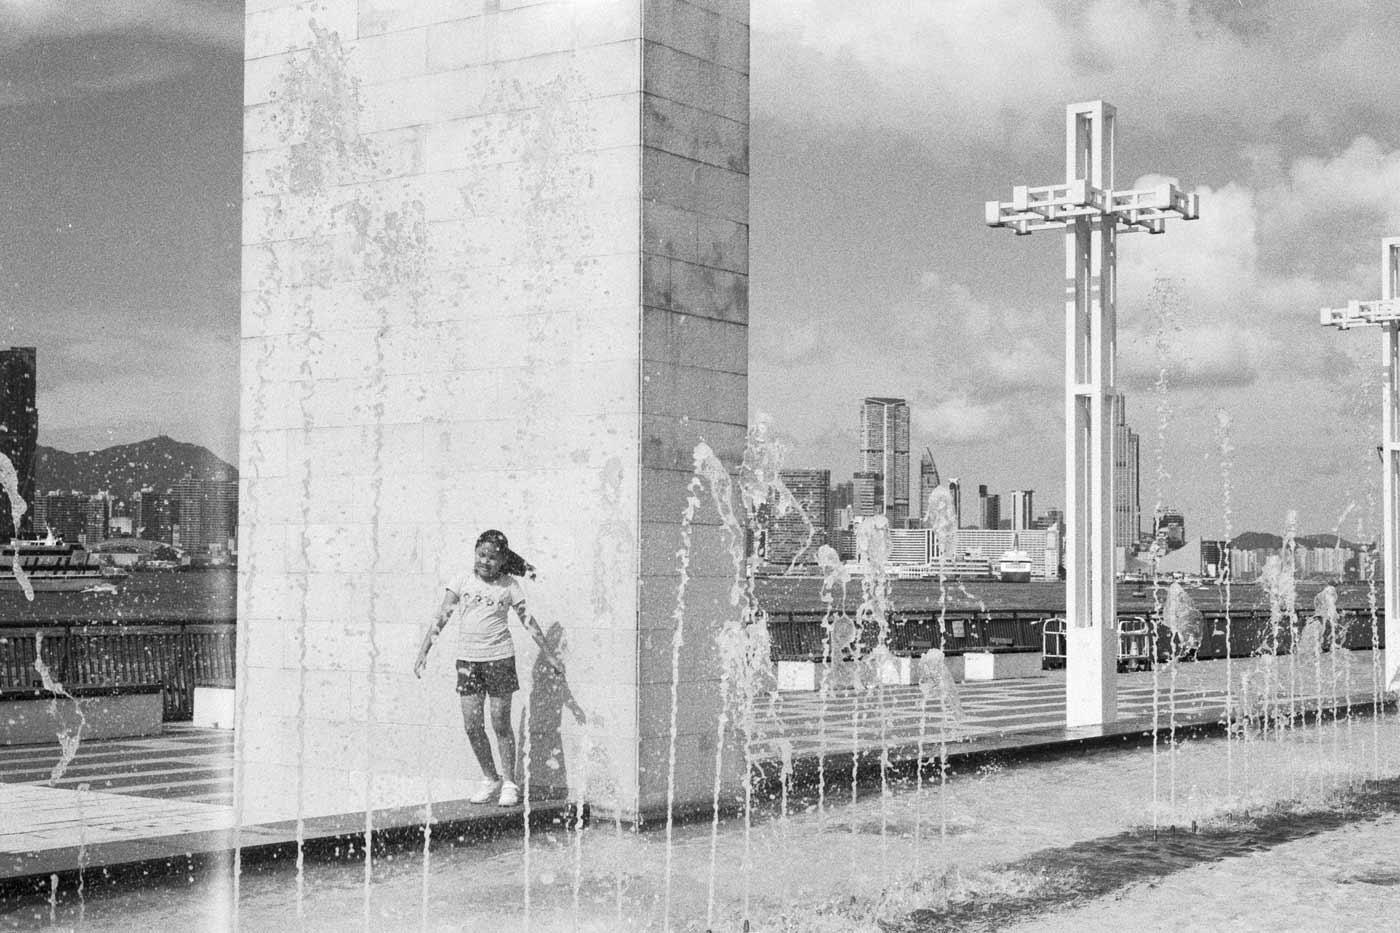 Leica-Summicron-50mm-50-f2-Rigid-Type-2-II-lens-review-HC110-Kentmere-400-self-developed-hong-kong-hk-suen-yat-sun-park